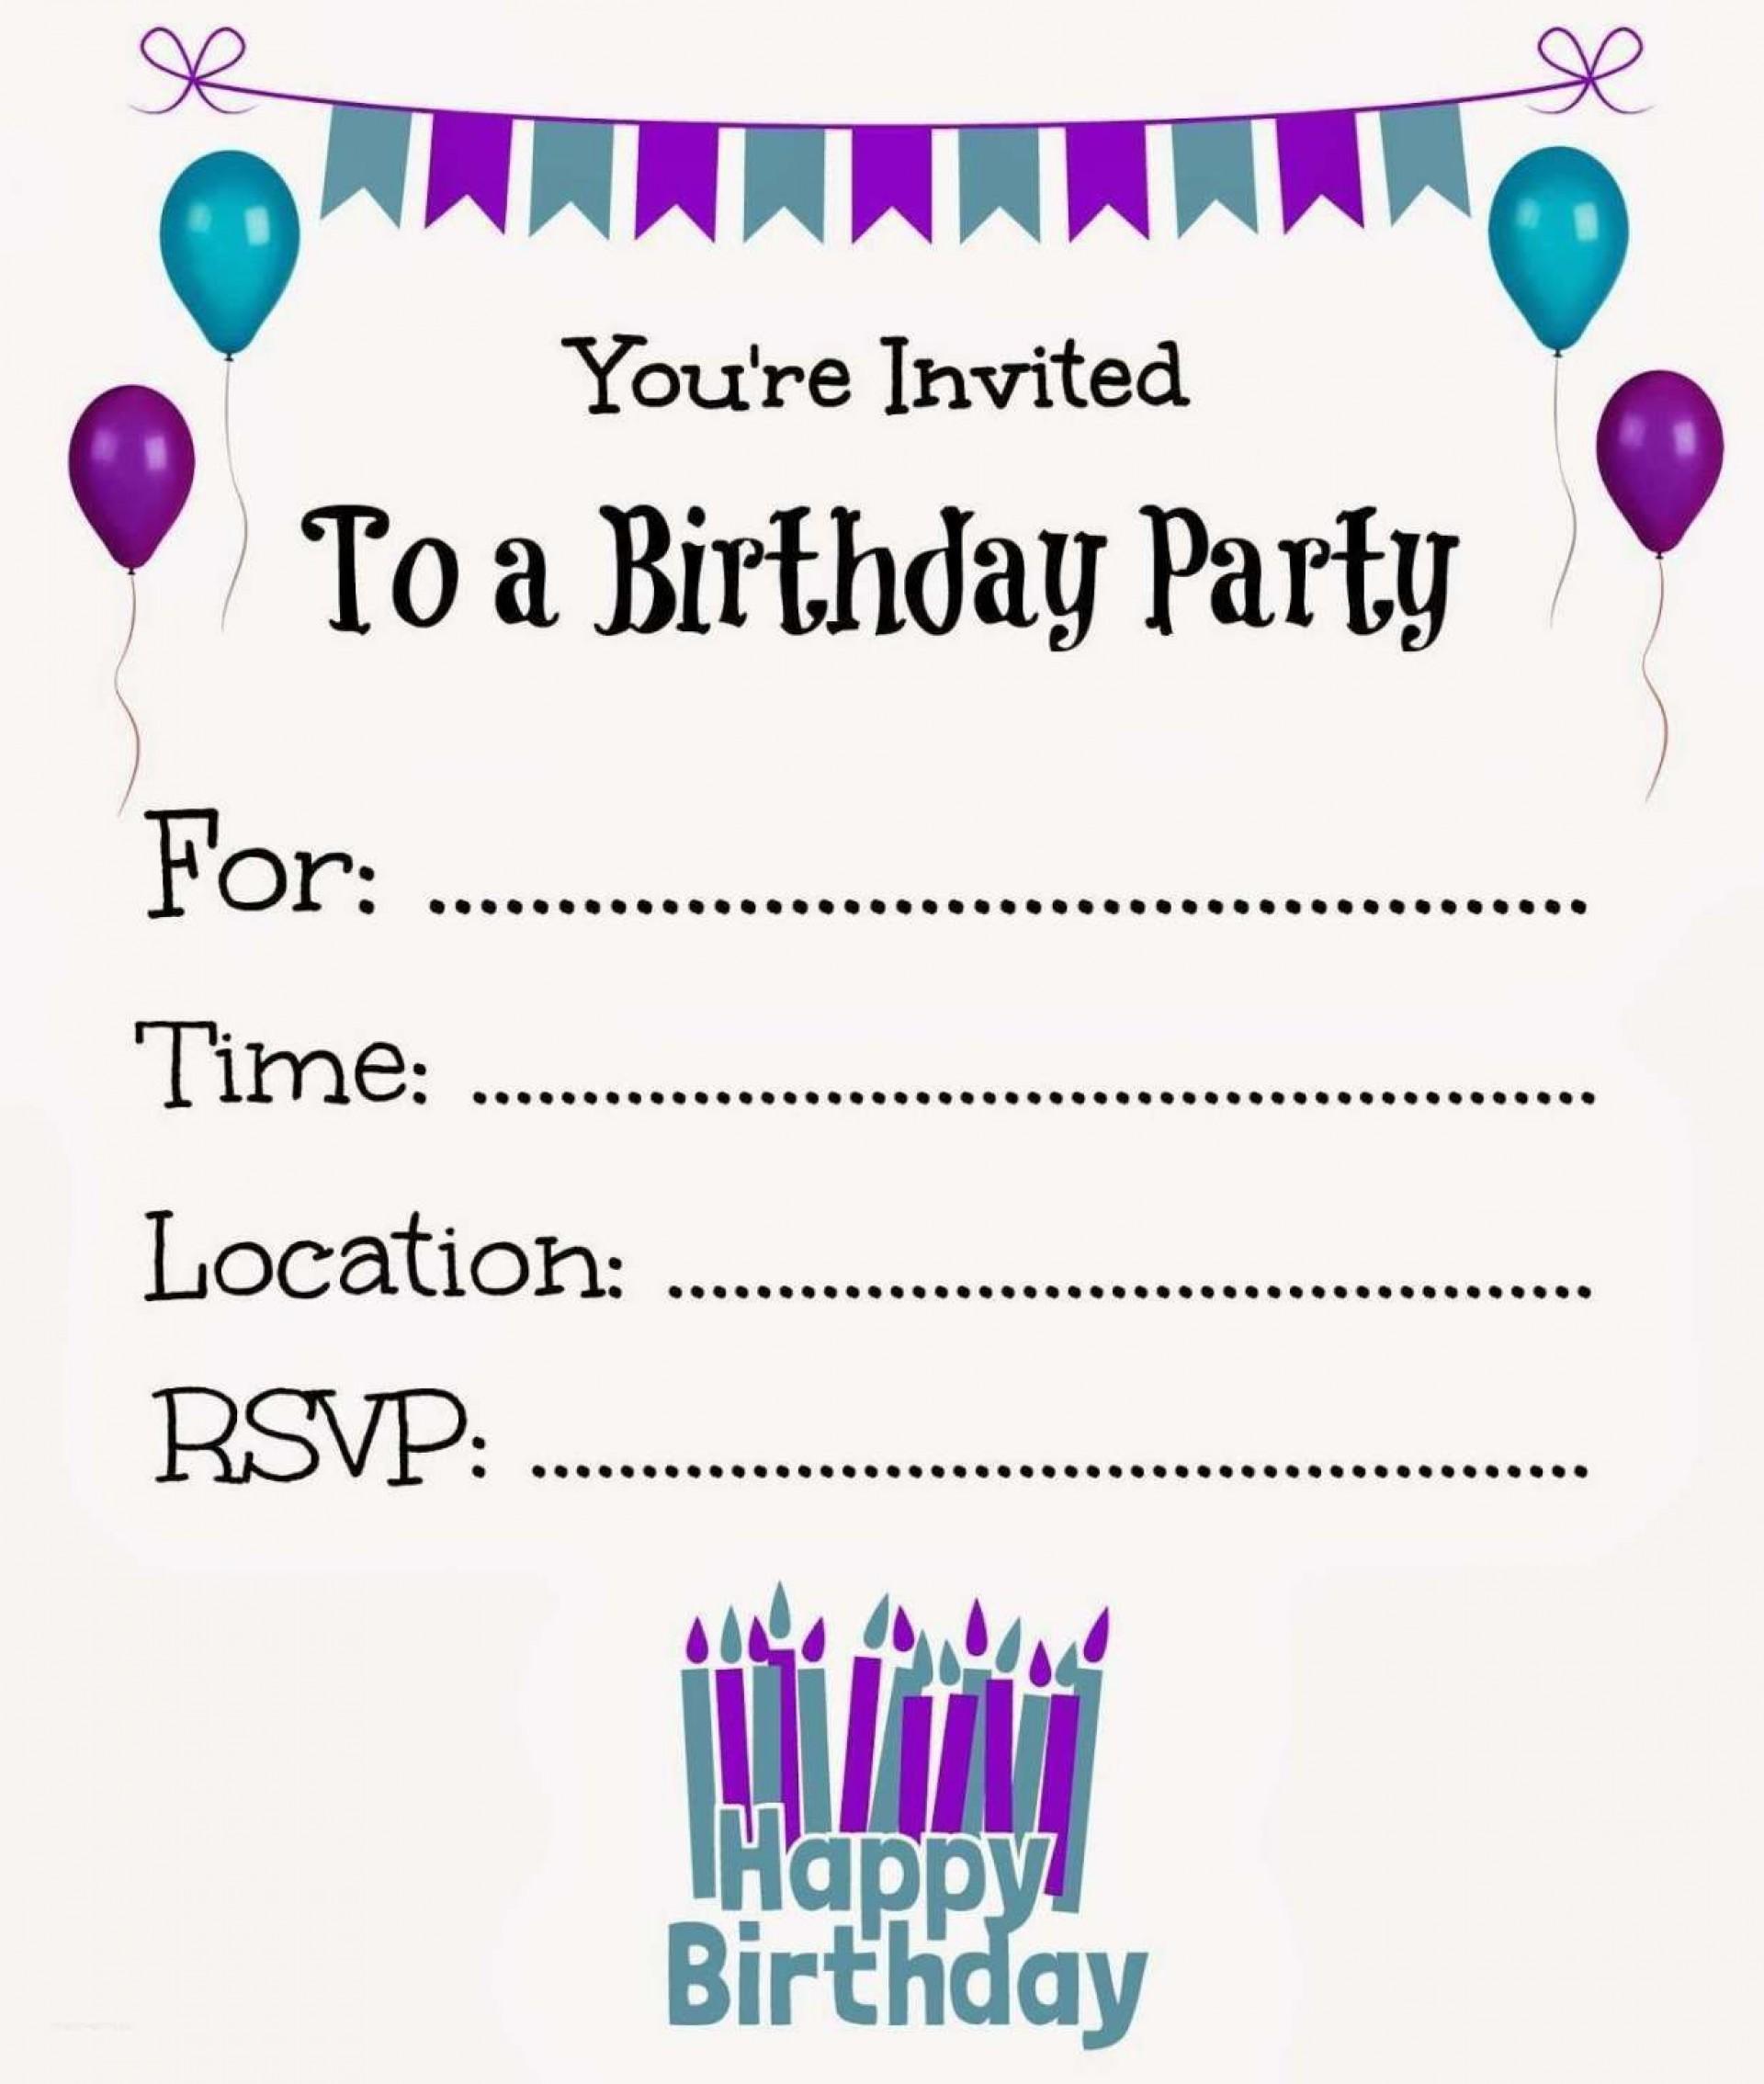 005 Fearsome Free Birthday Card Invitation Template Printable Idea 1920